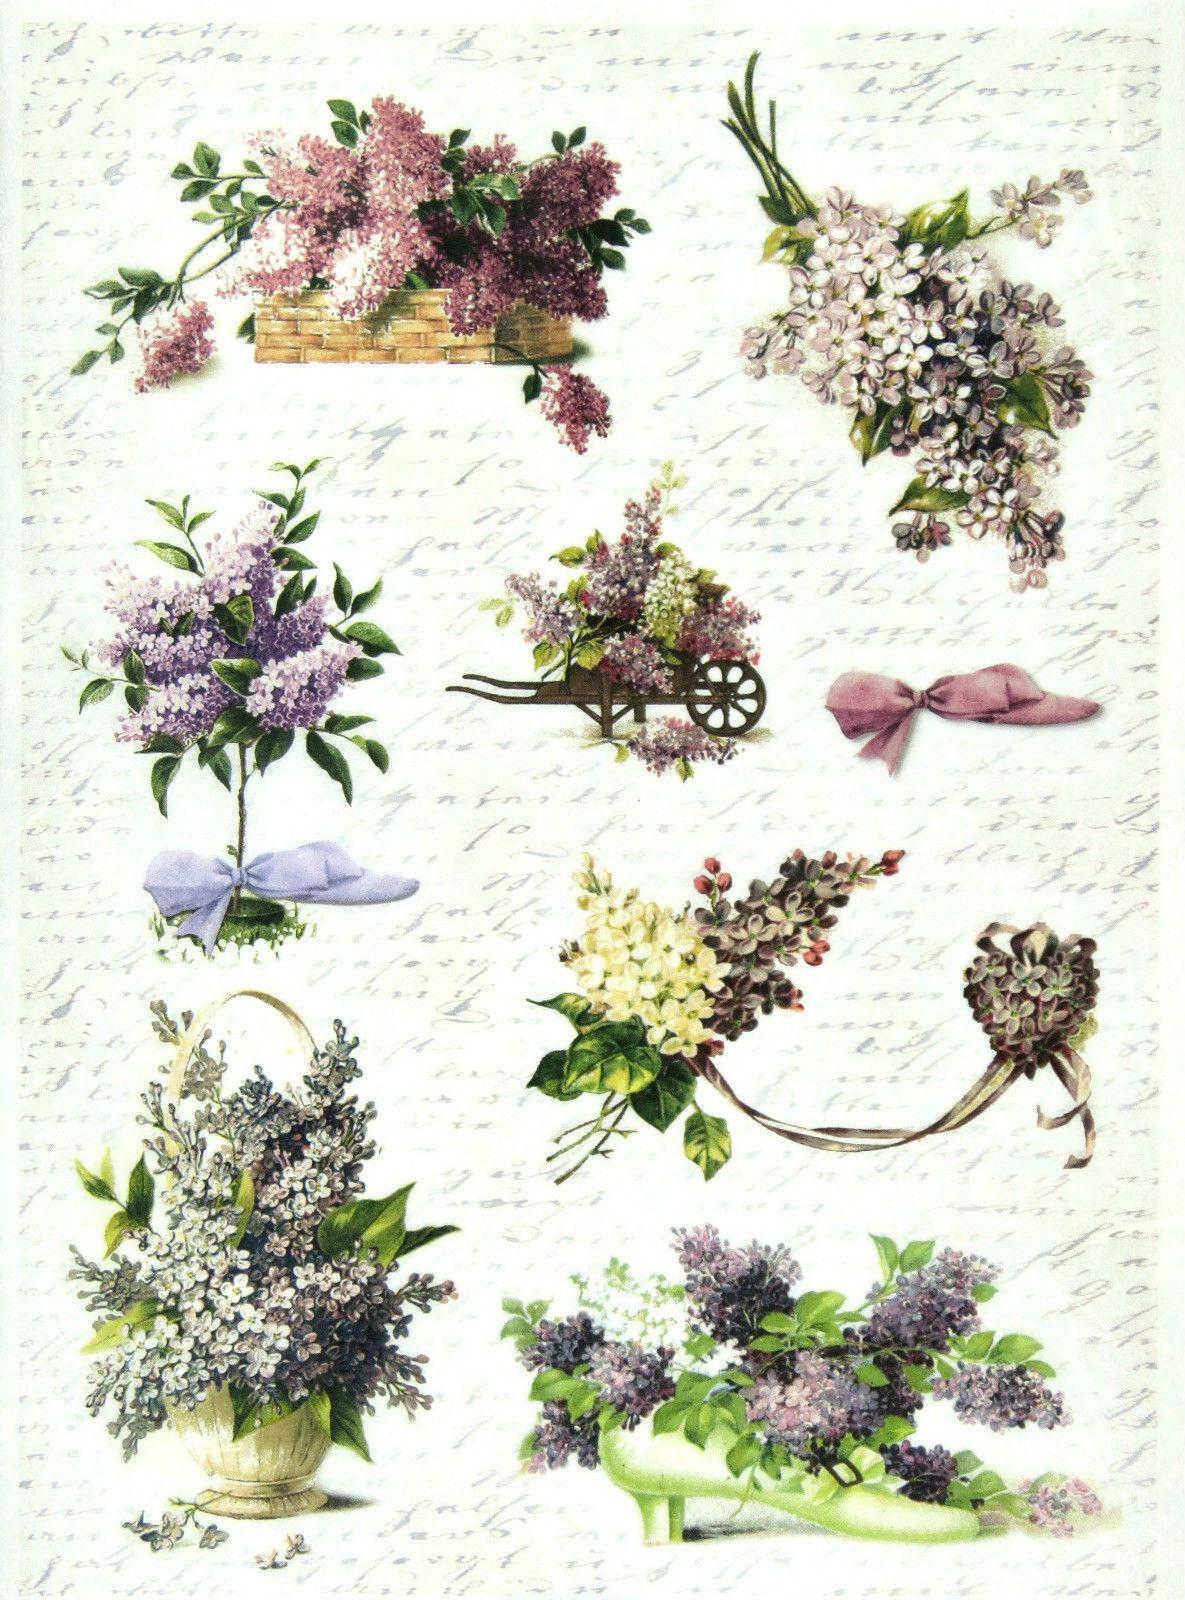 57g 11851600 Figuras Para Decoupage Pinterest